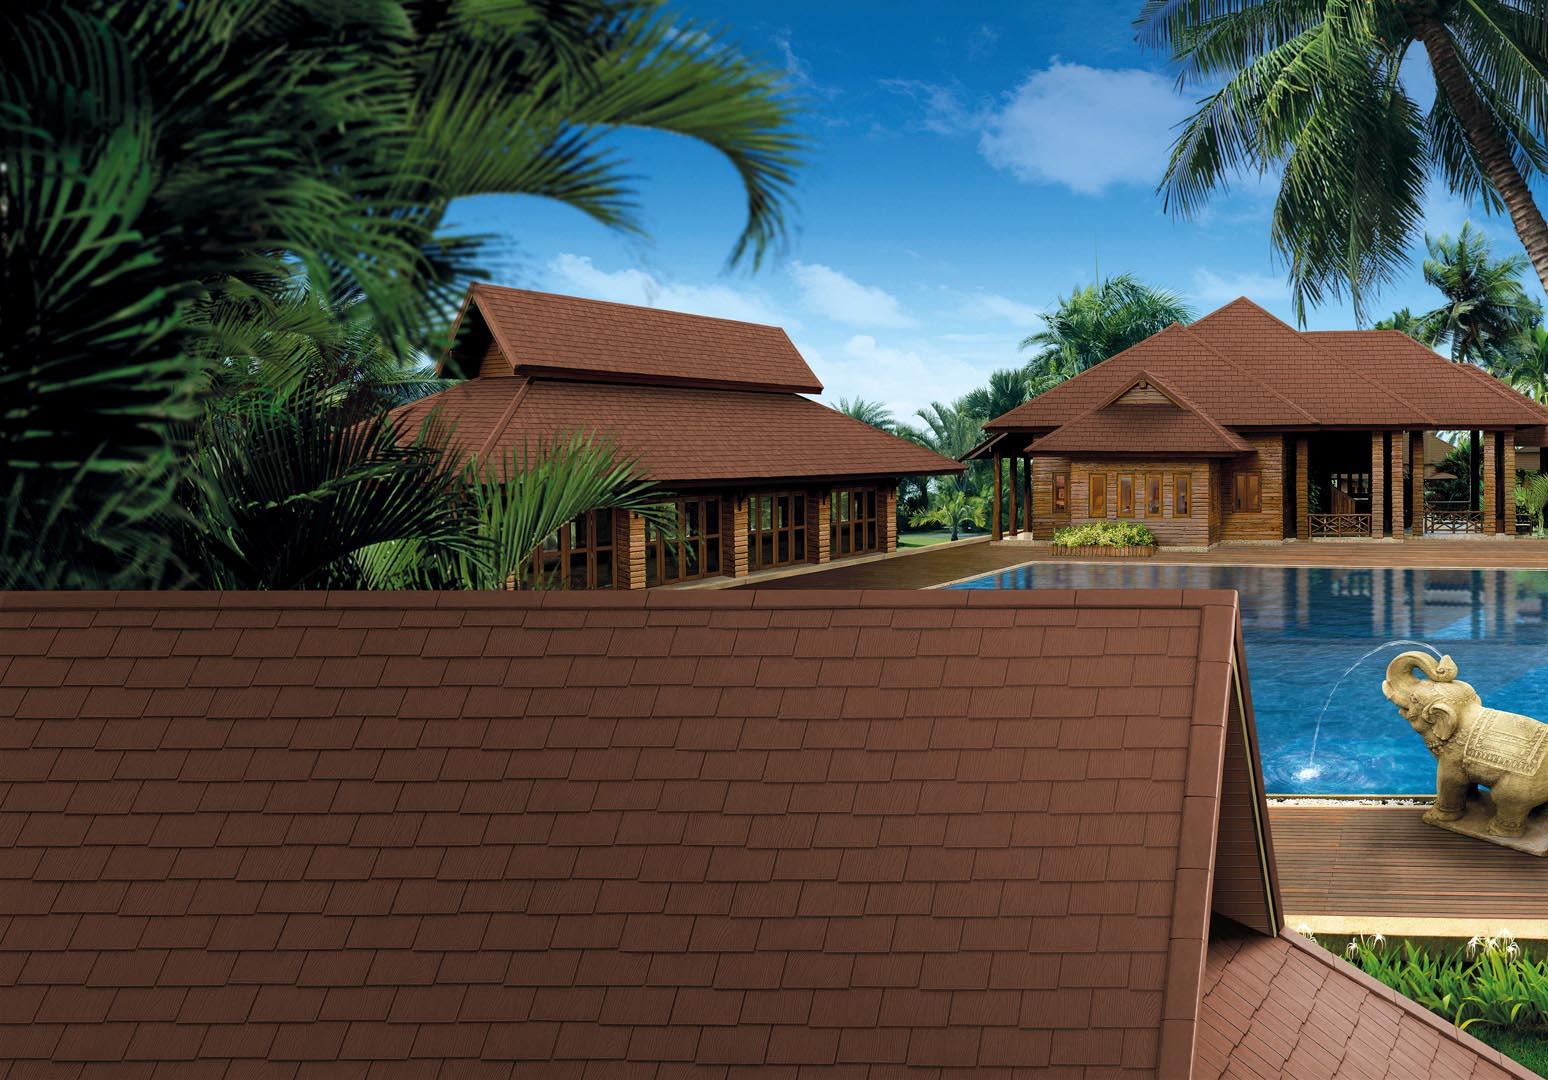 SCG-Fiber-Cement-Roof-Ayara-Timber-Grain-Golden-Teak